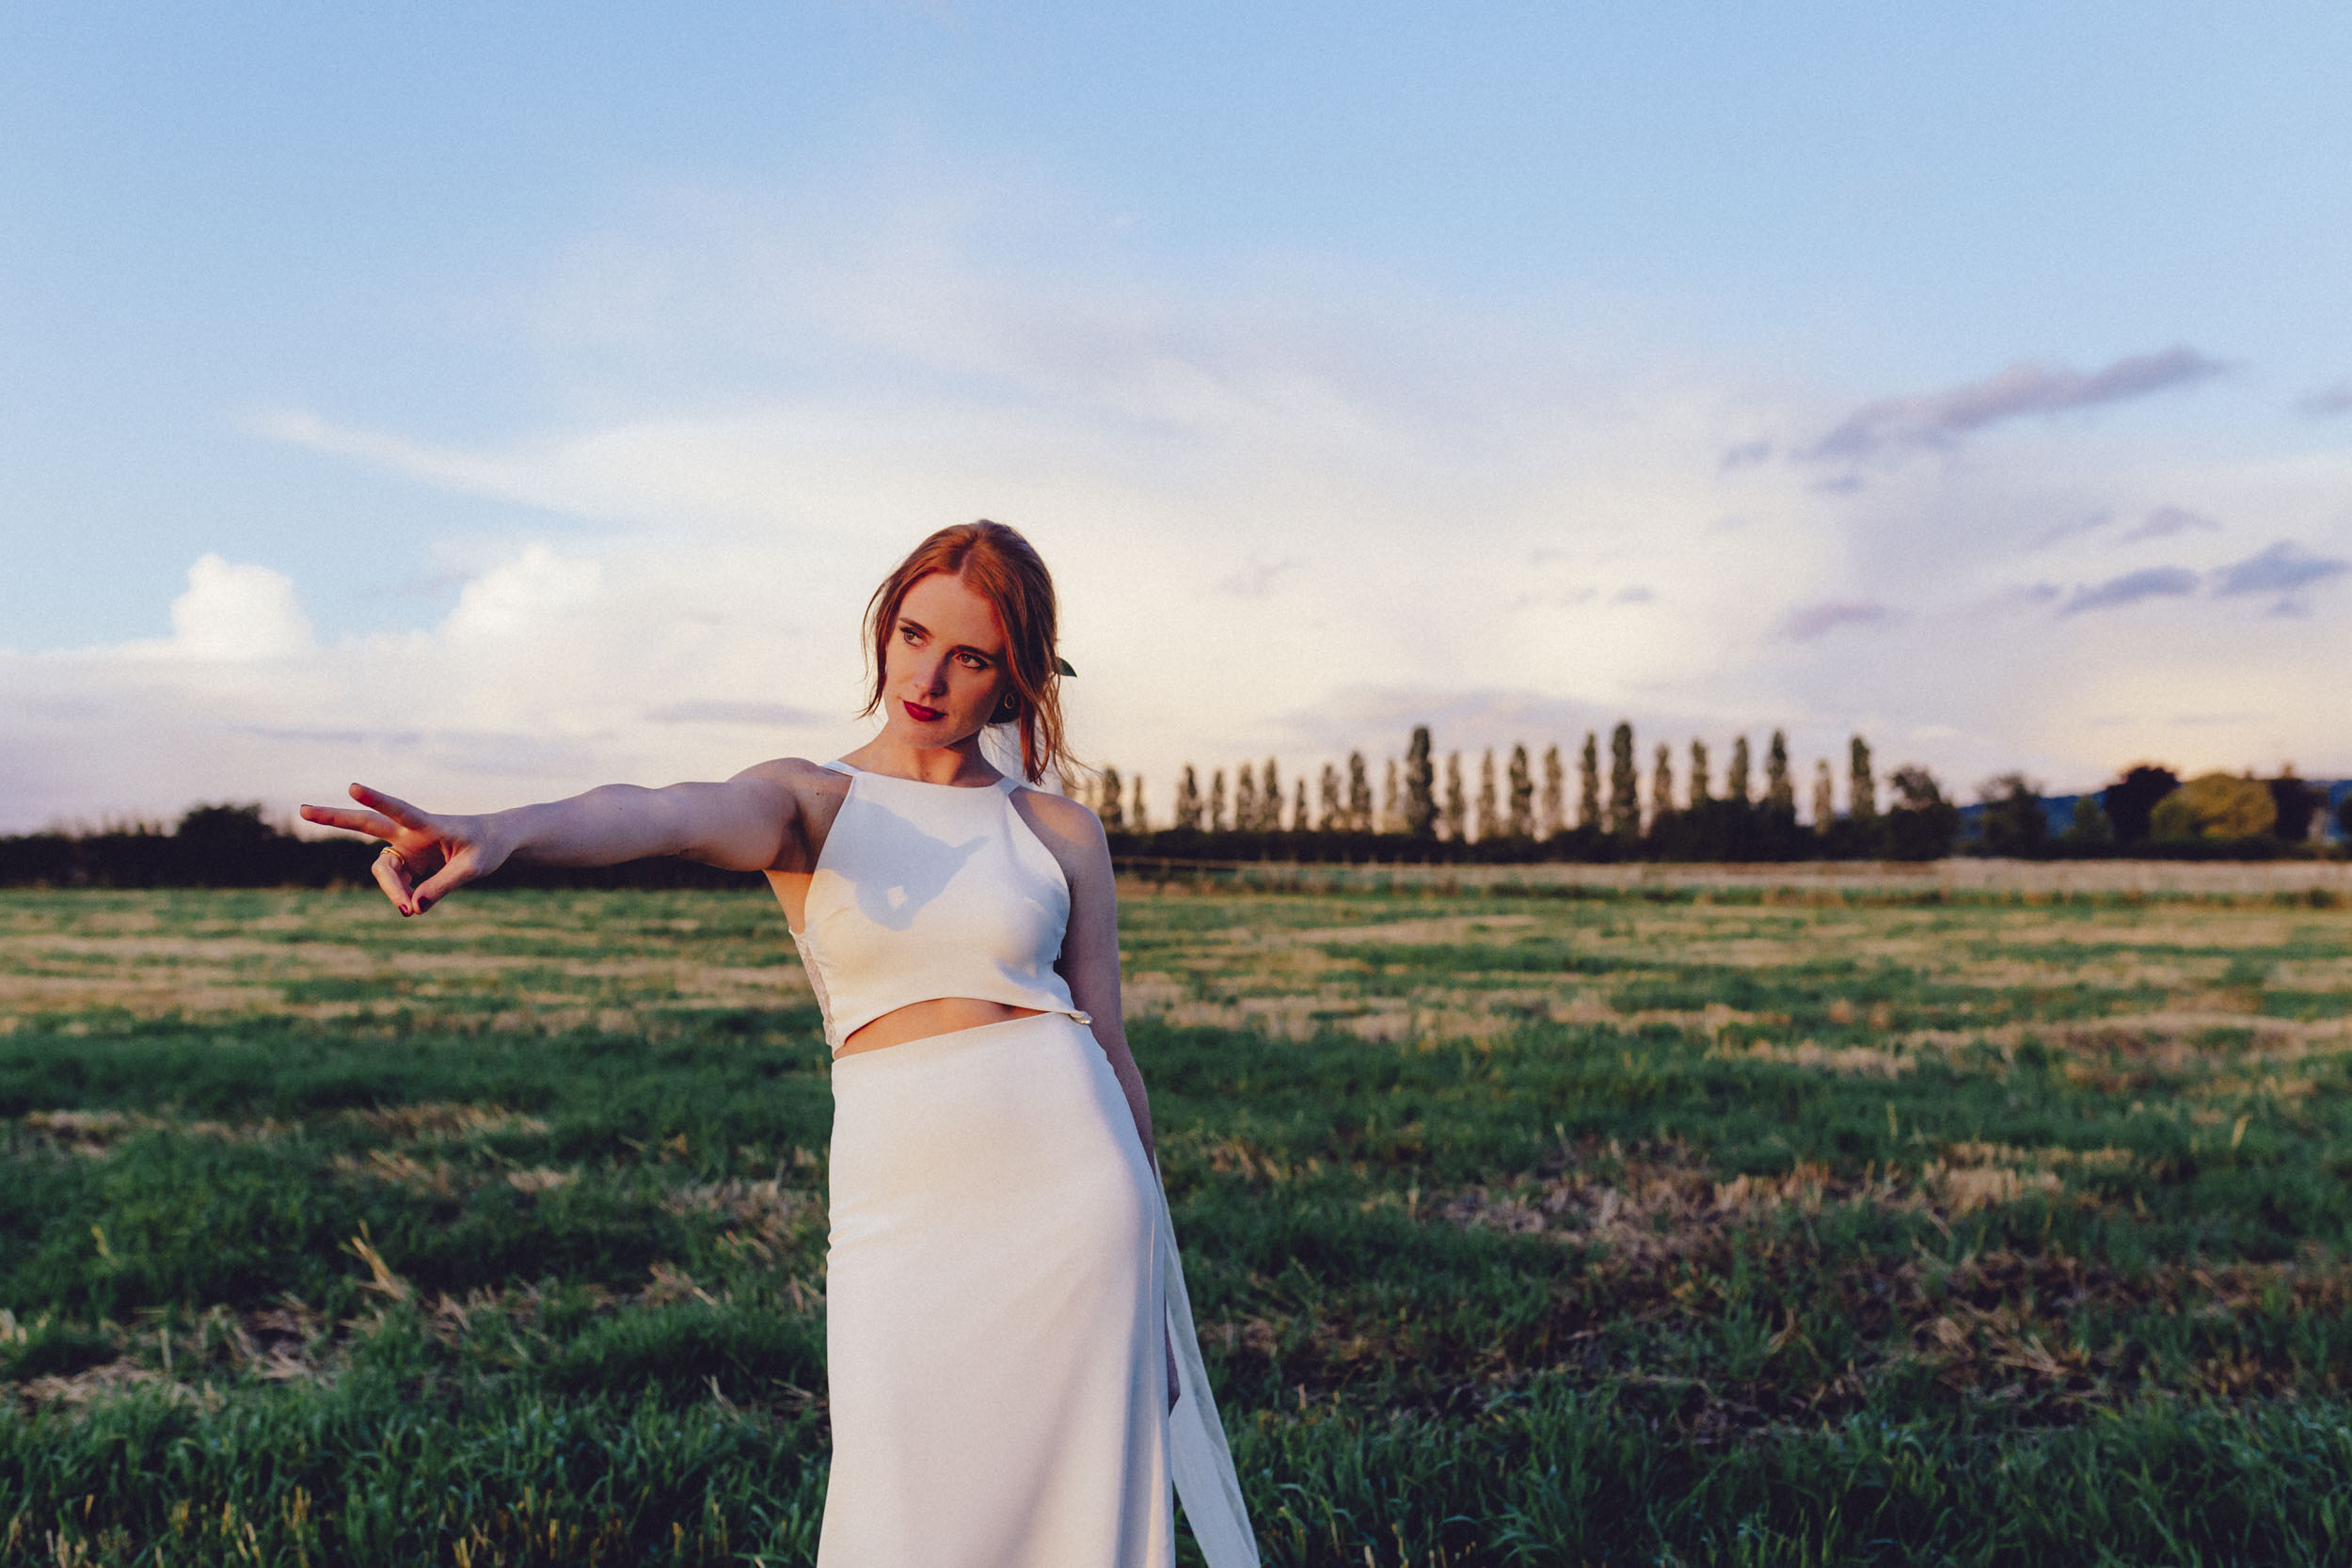 Brockworth court barn-unconventional fun wedding photography079.jpg